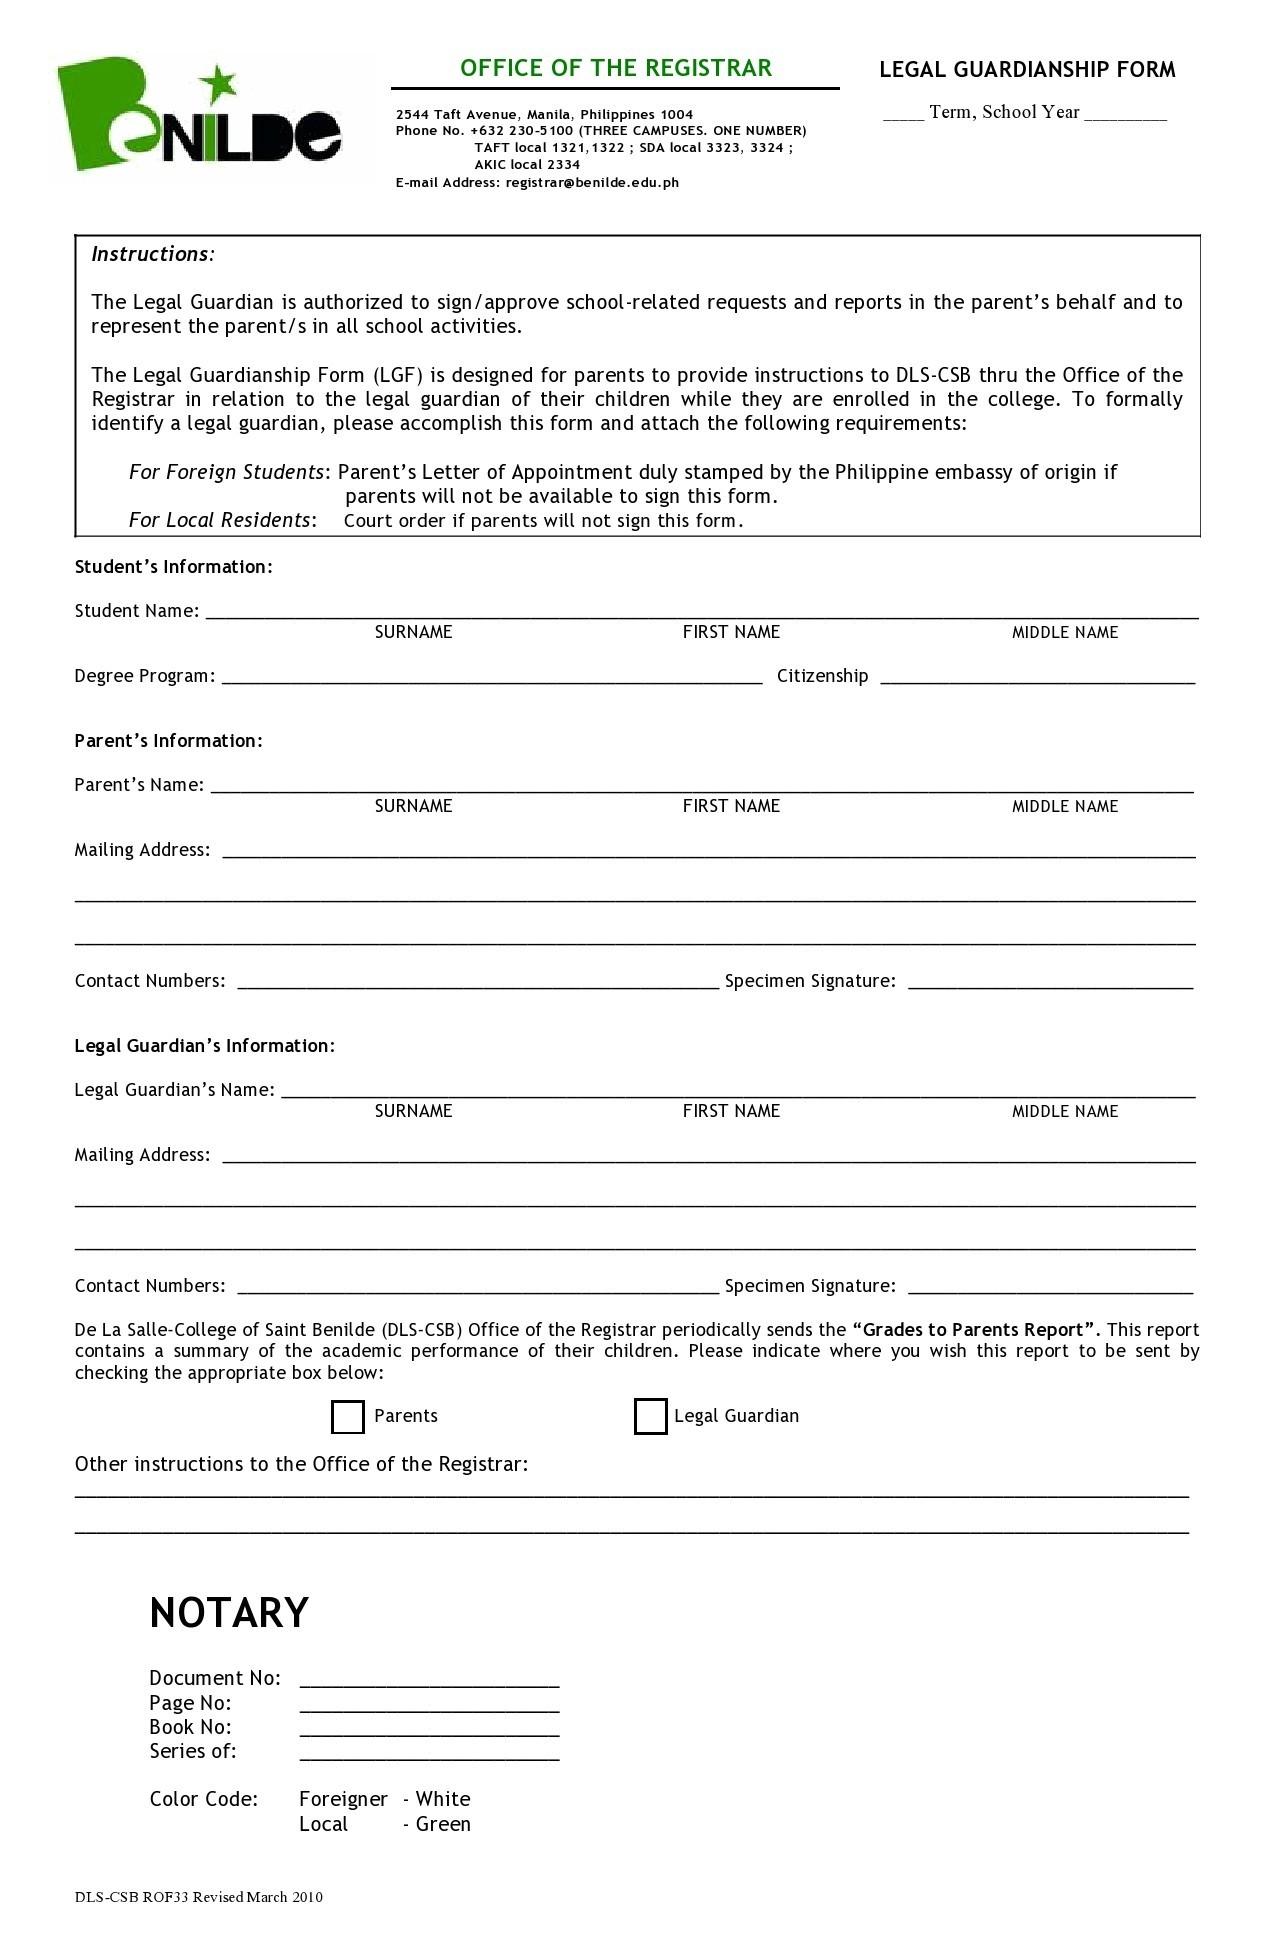 Free guardianship form 04